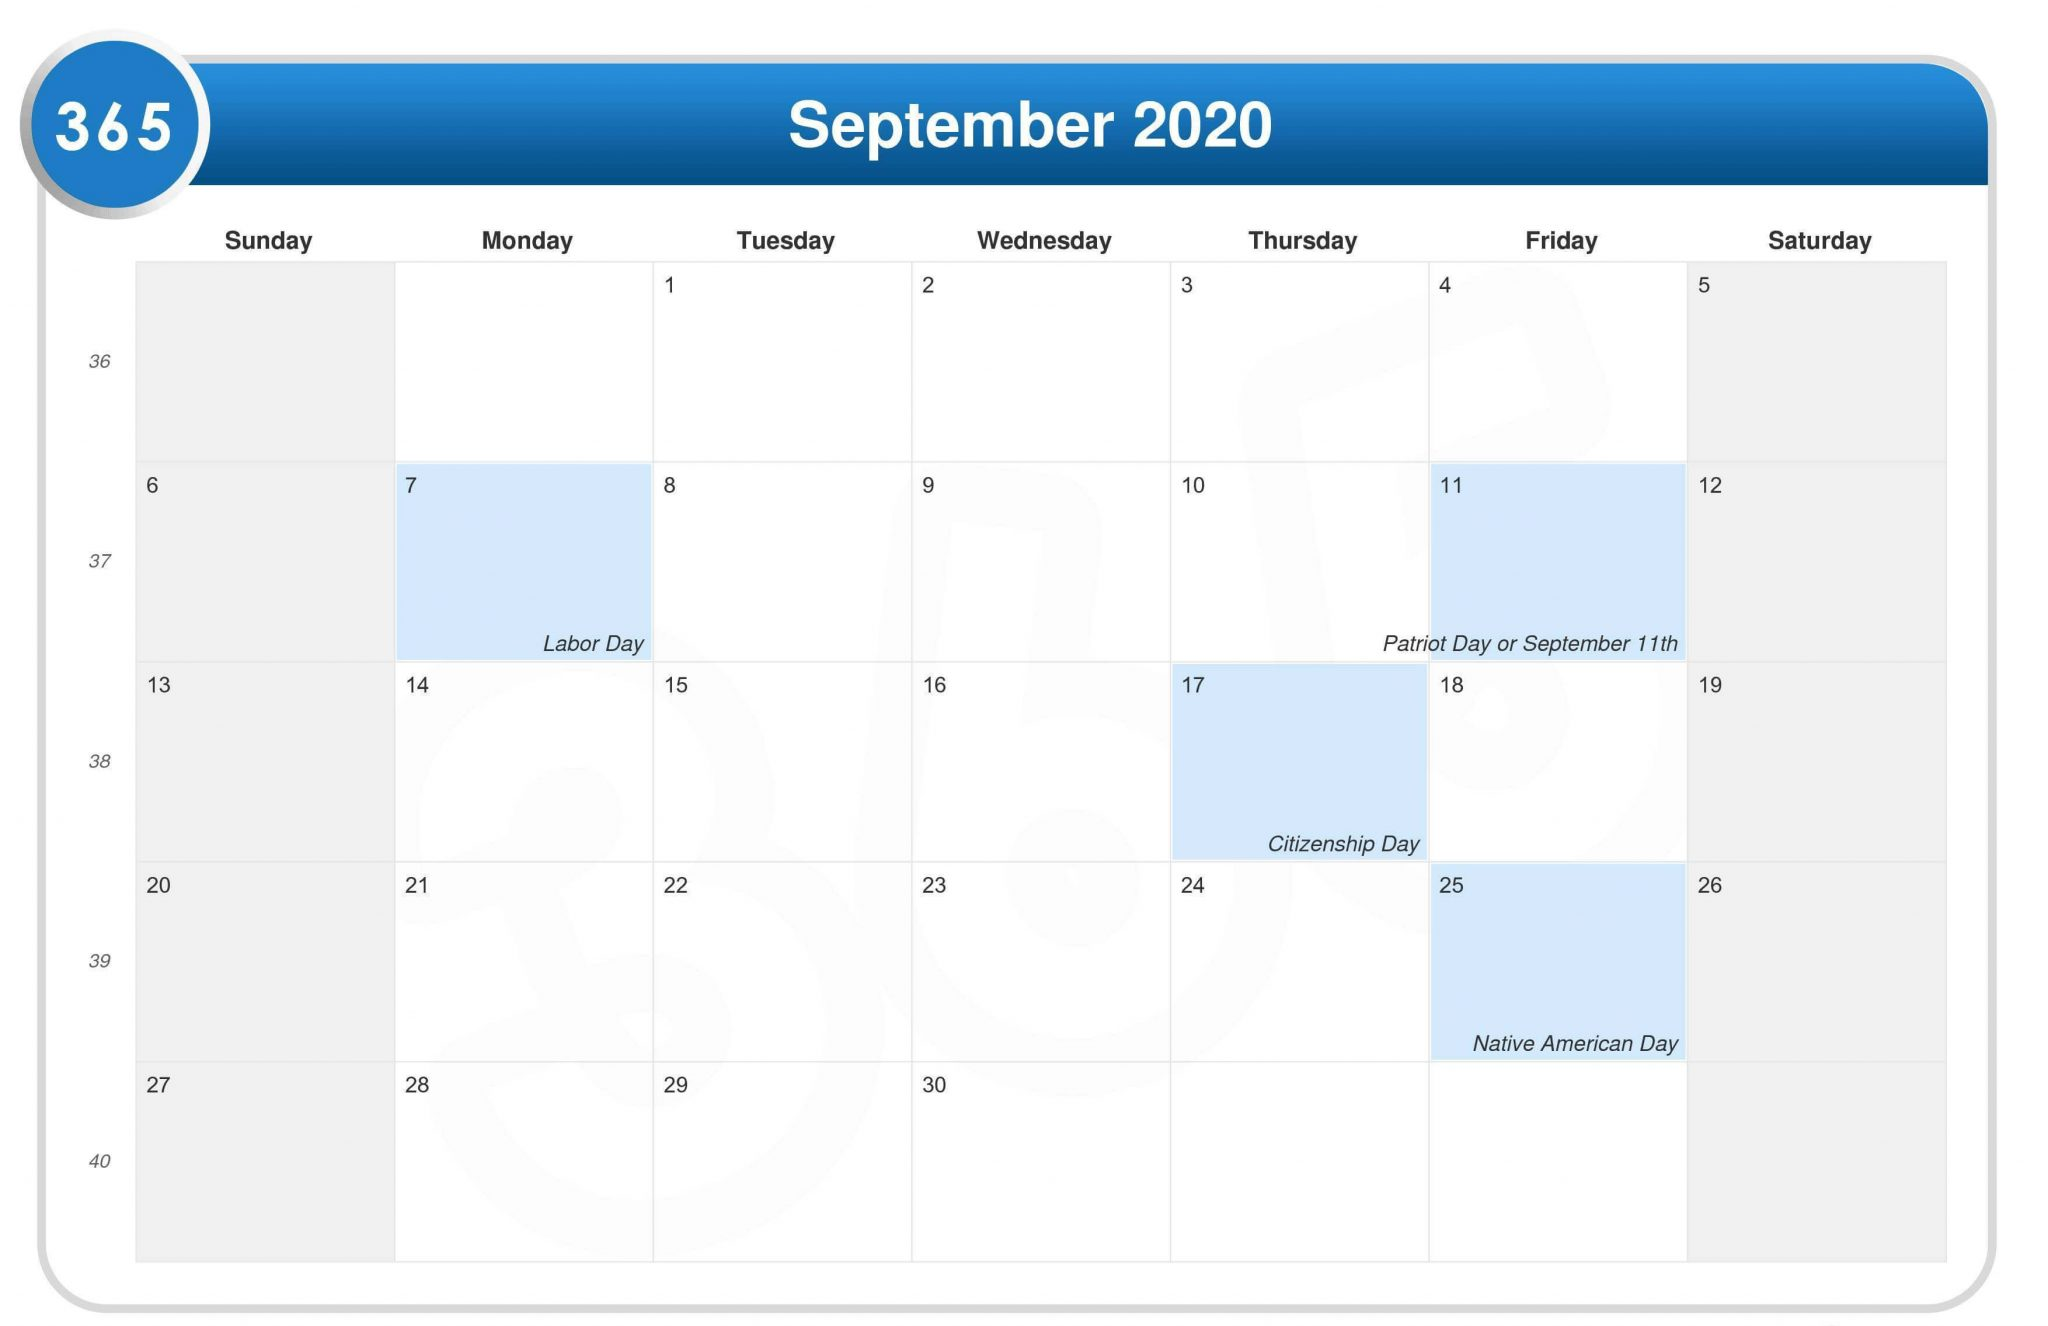 September 2020 Kalender mit Feiertagen